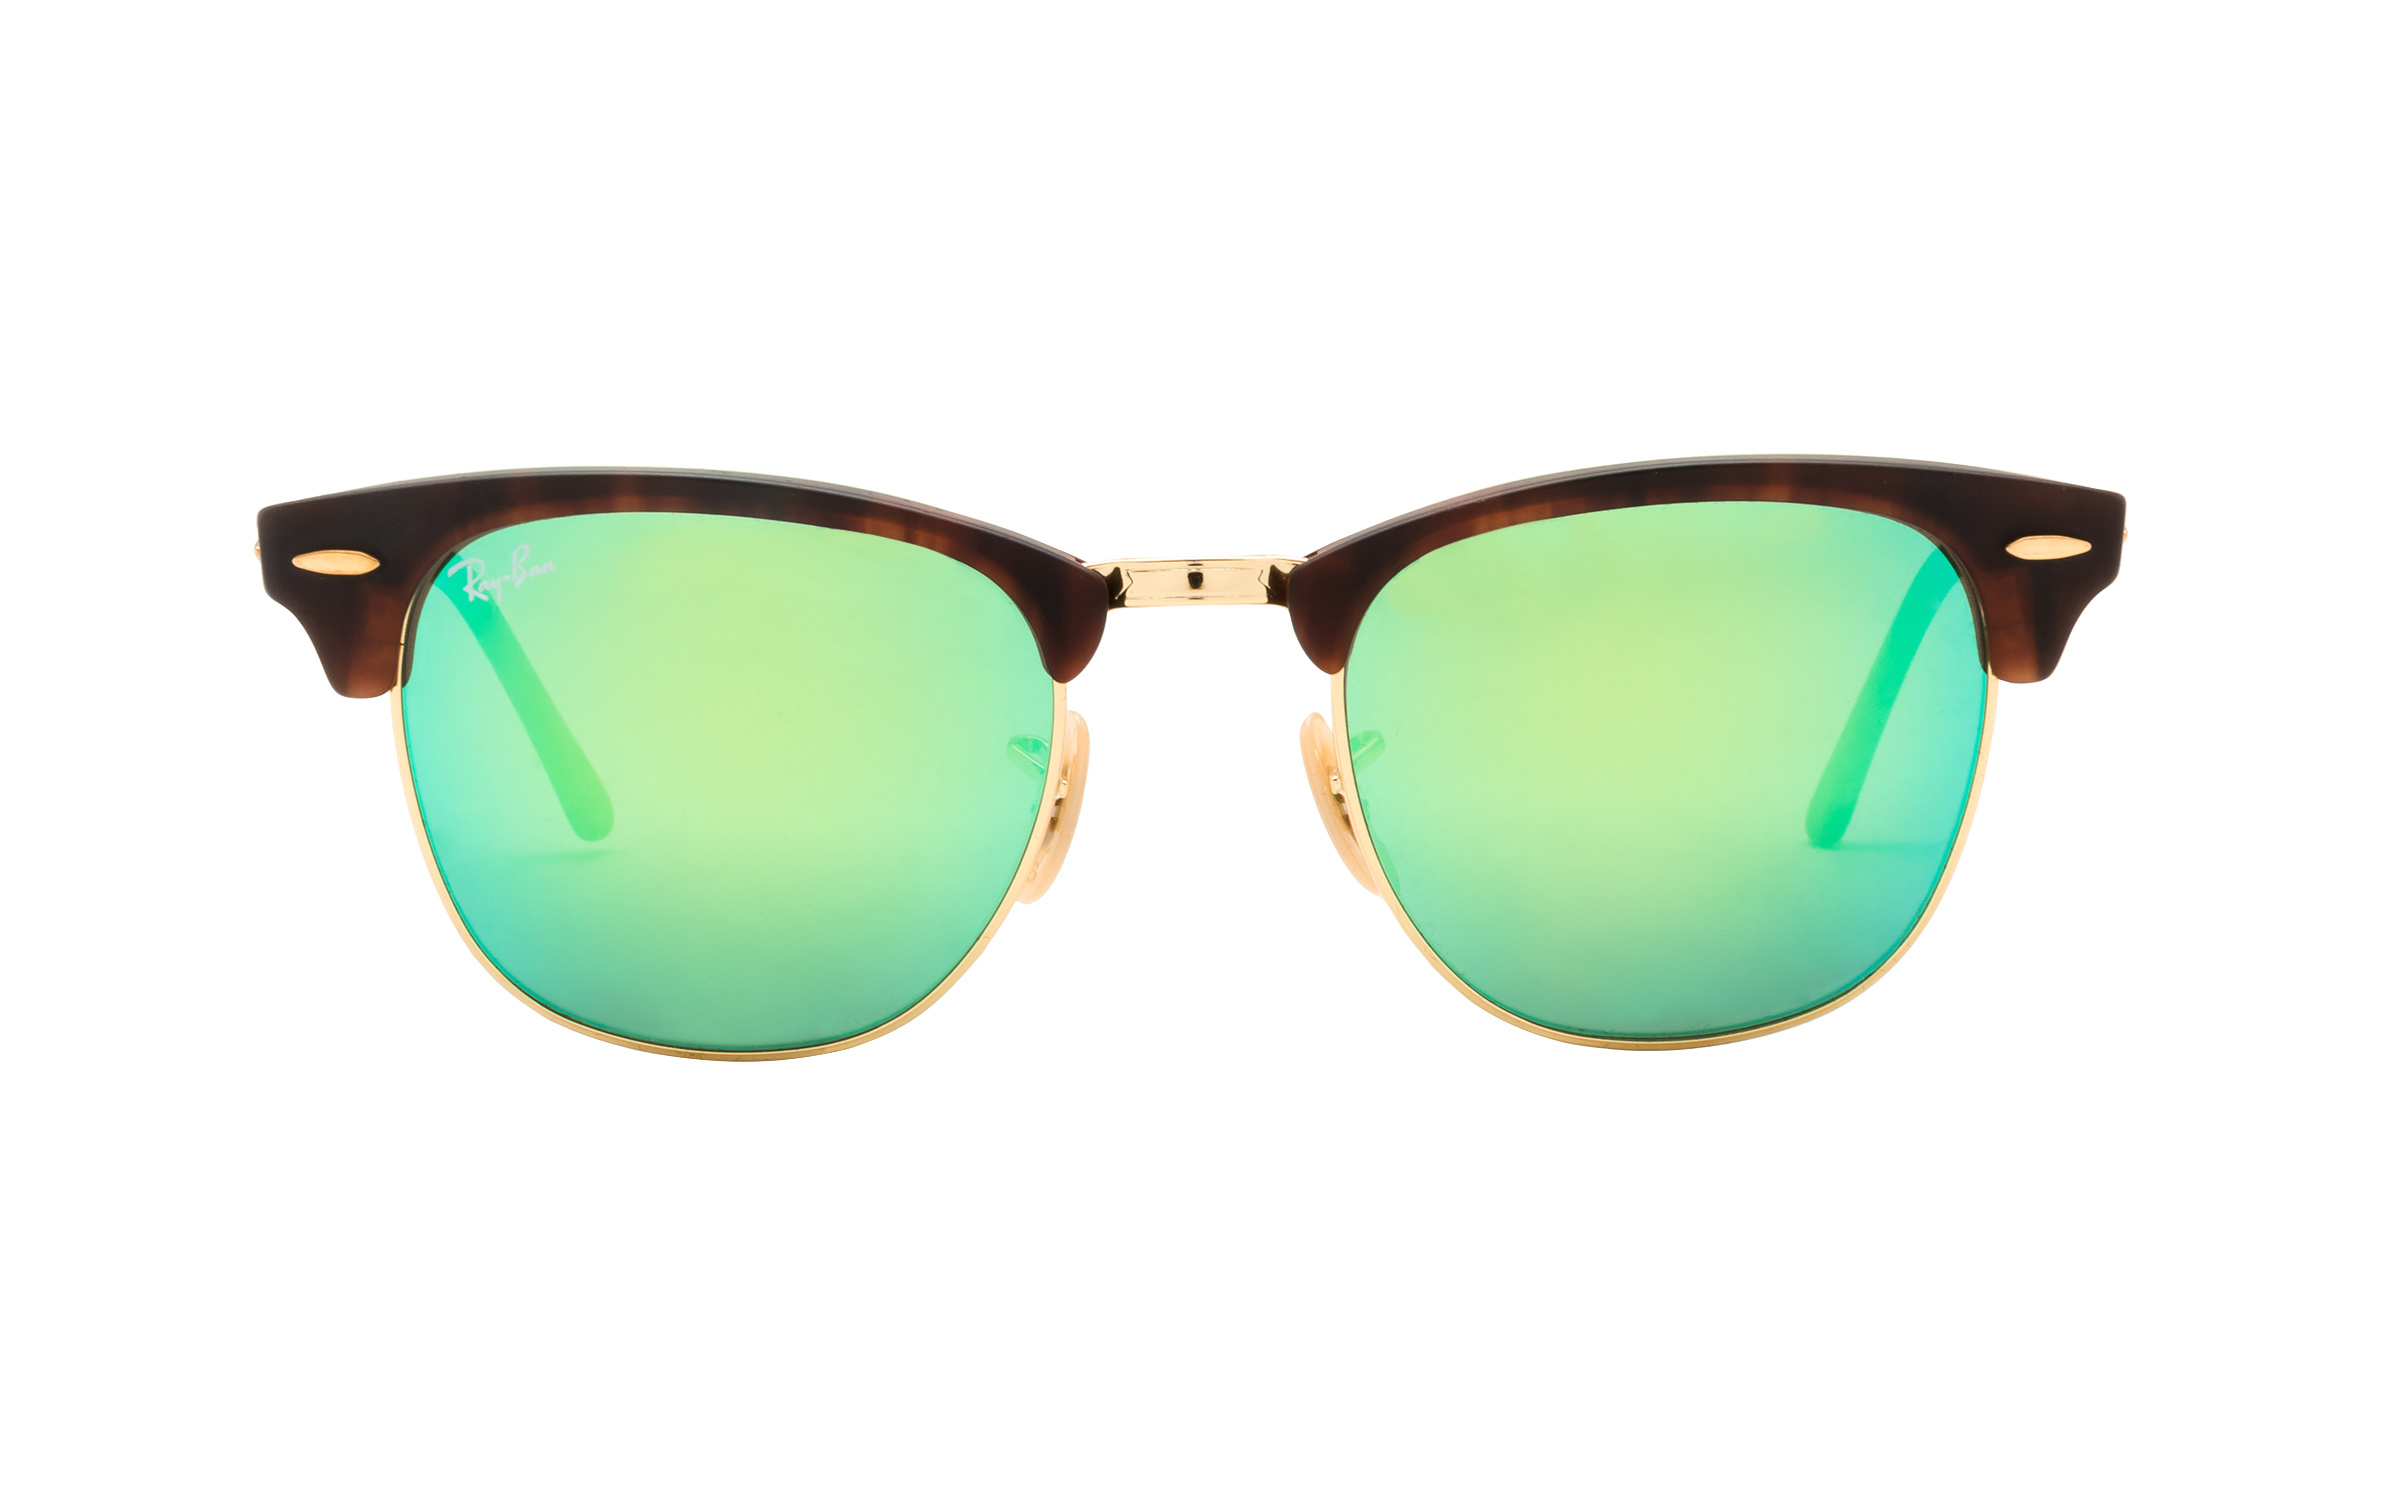 Ray-Ban 3016 114 519 Green Mirror 51 Sunglasses